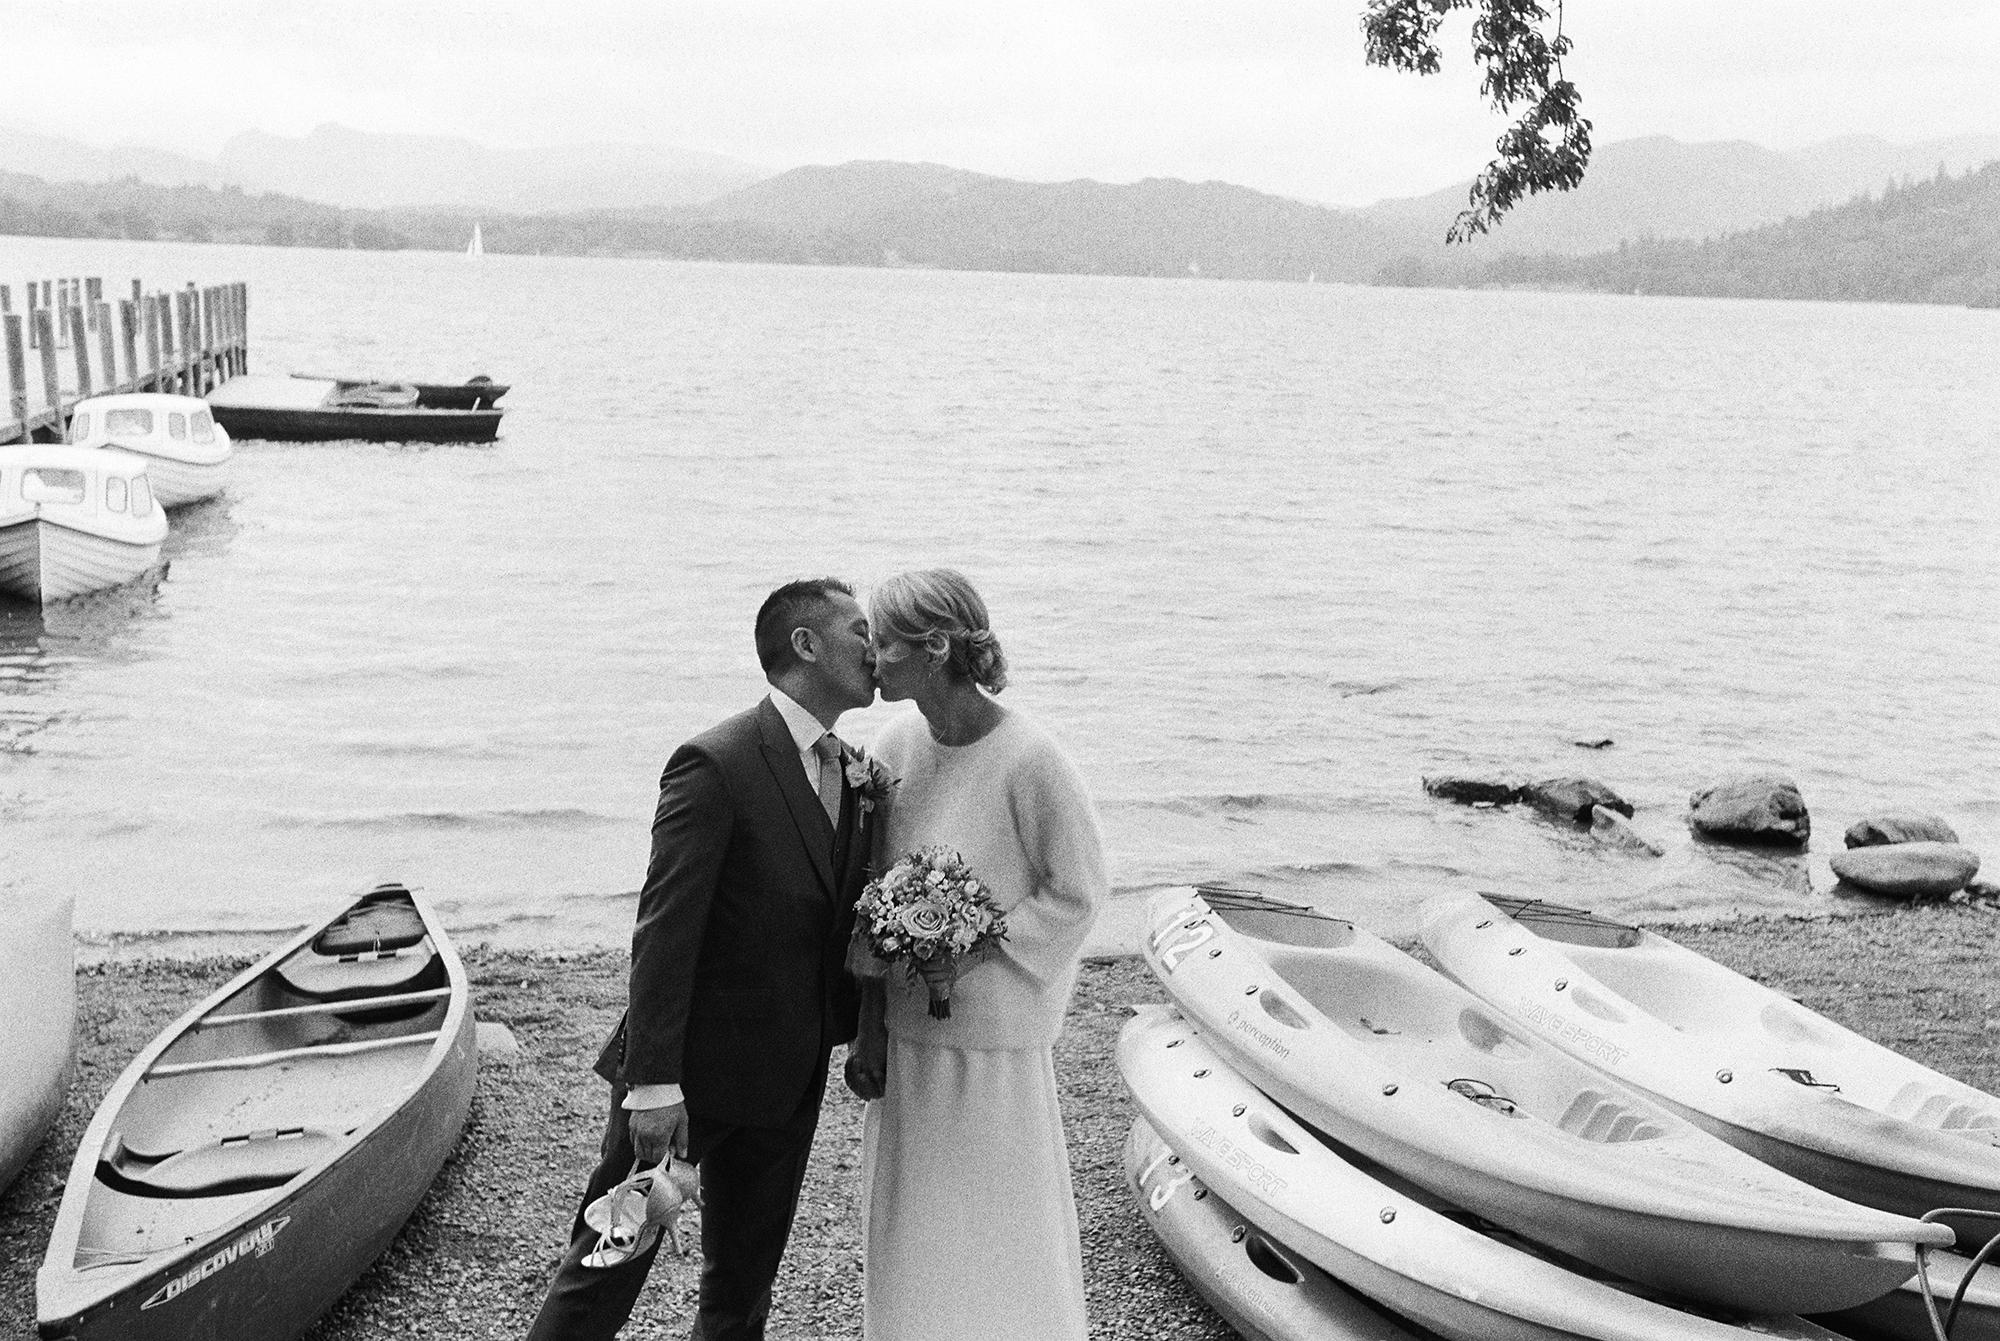 wedding_photographer_cumbria037.jpg